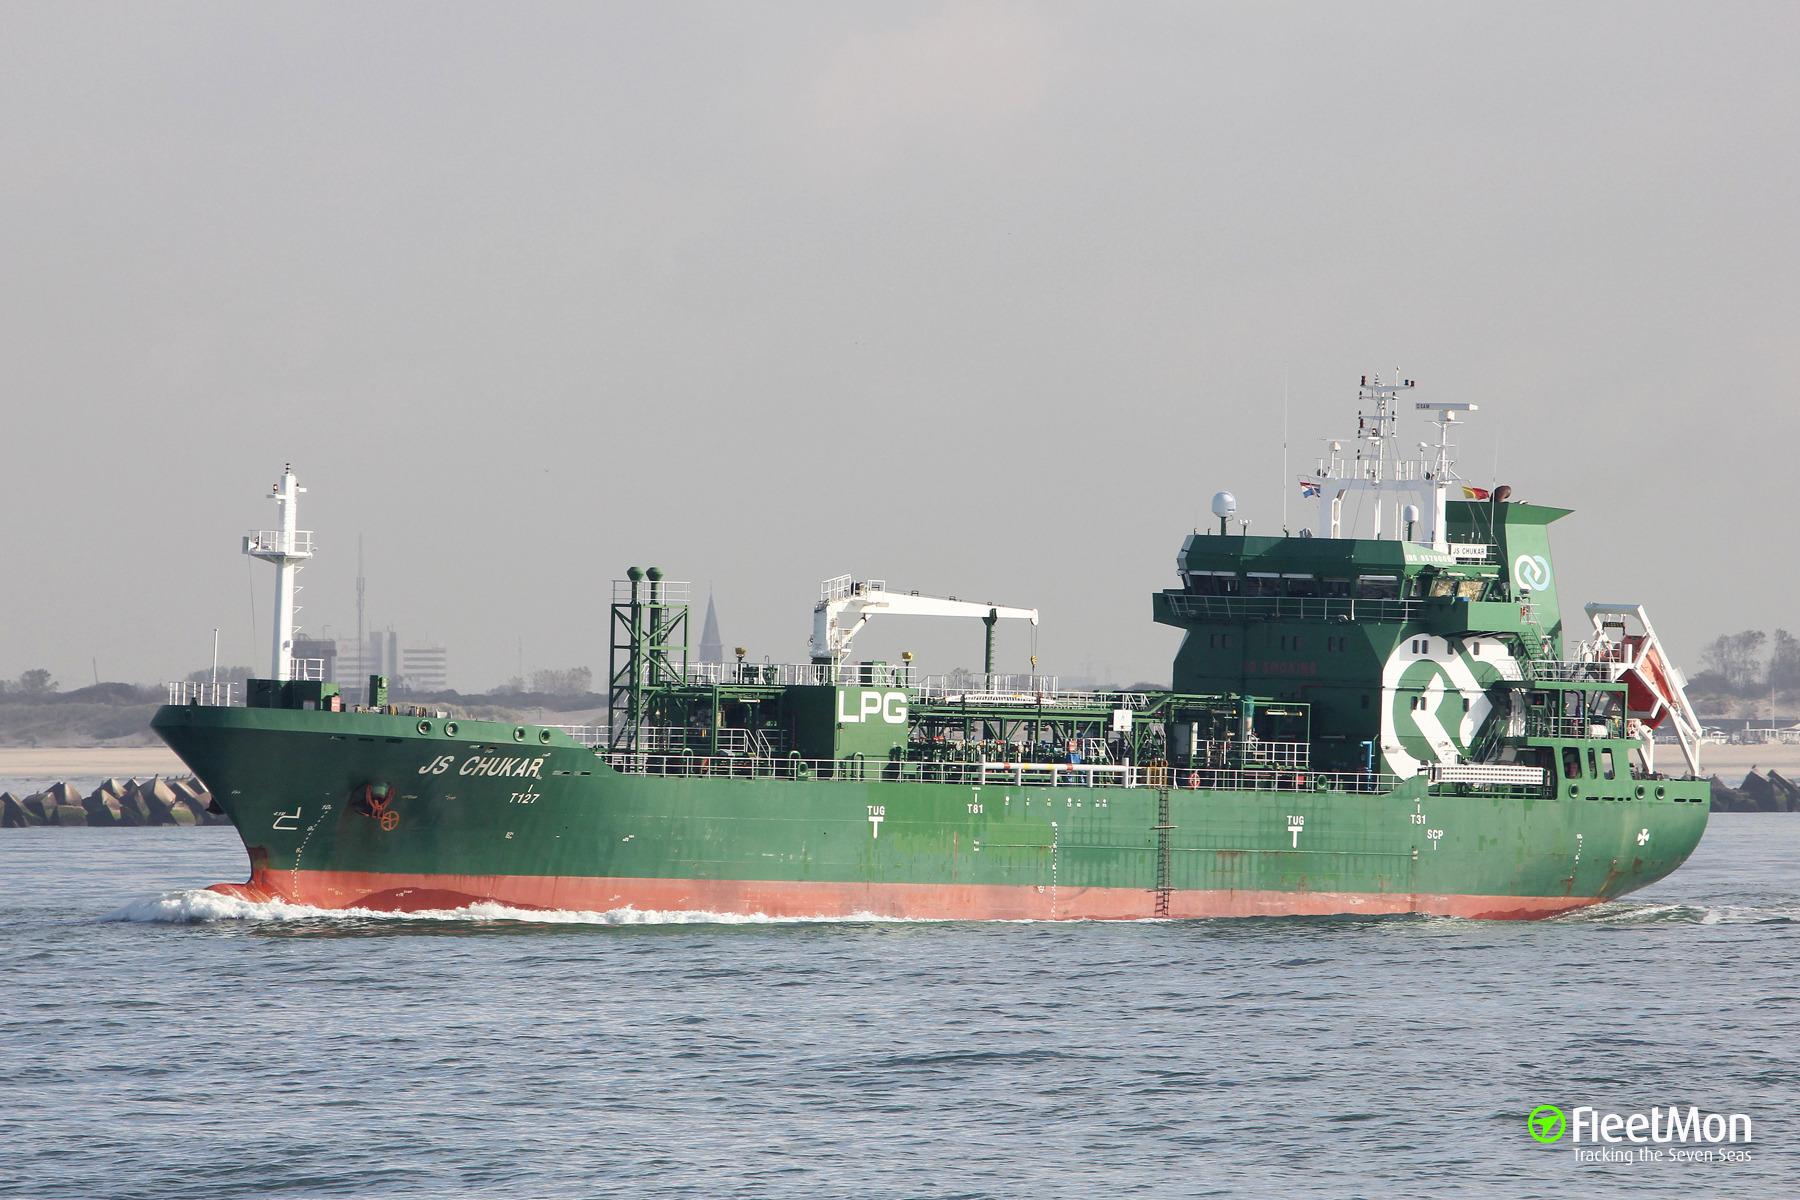 LNG tanker JS Chukar ran aground in Kerch Strait